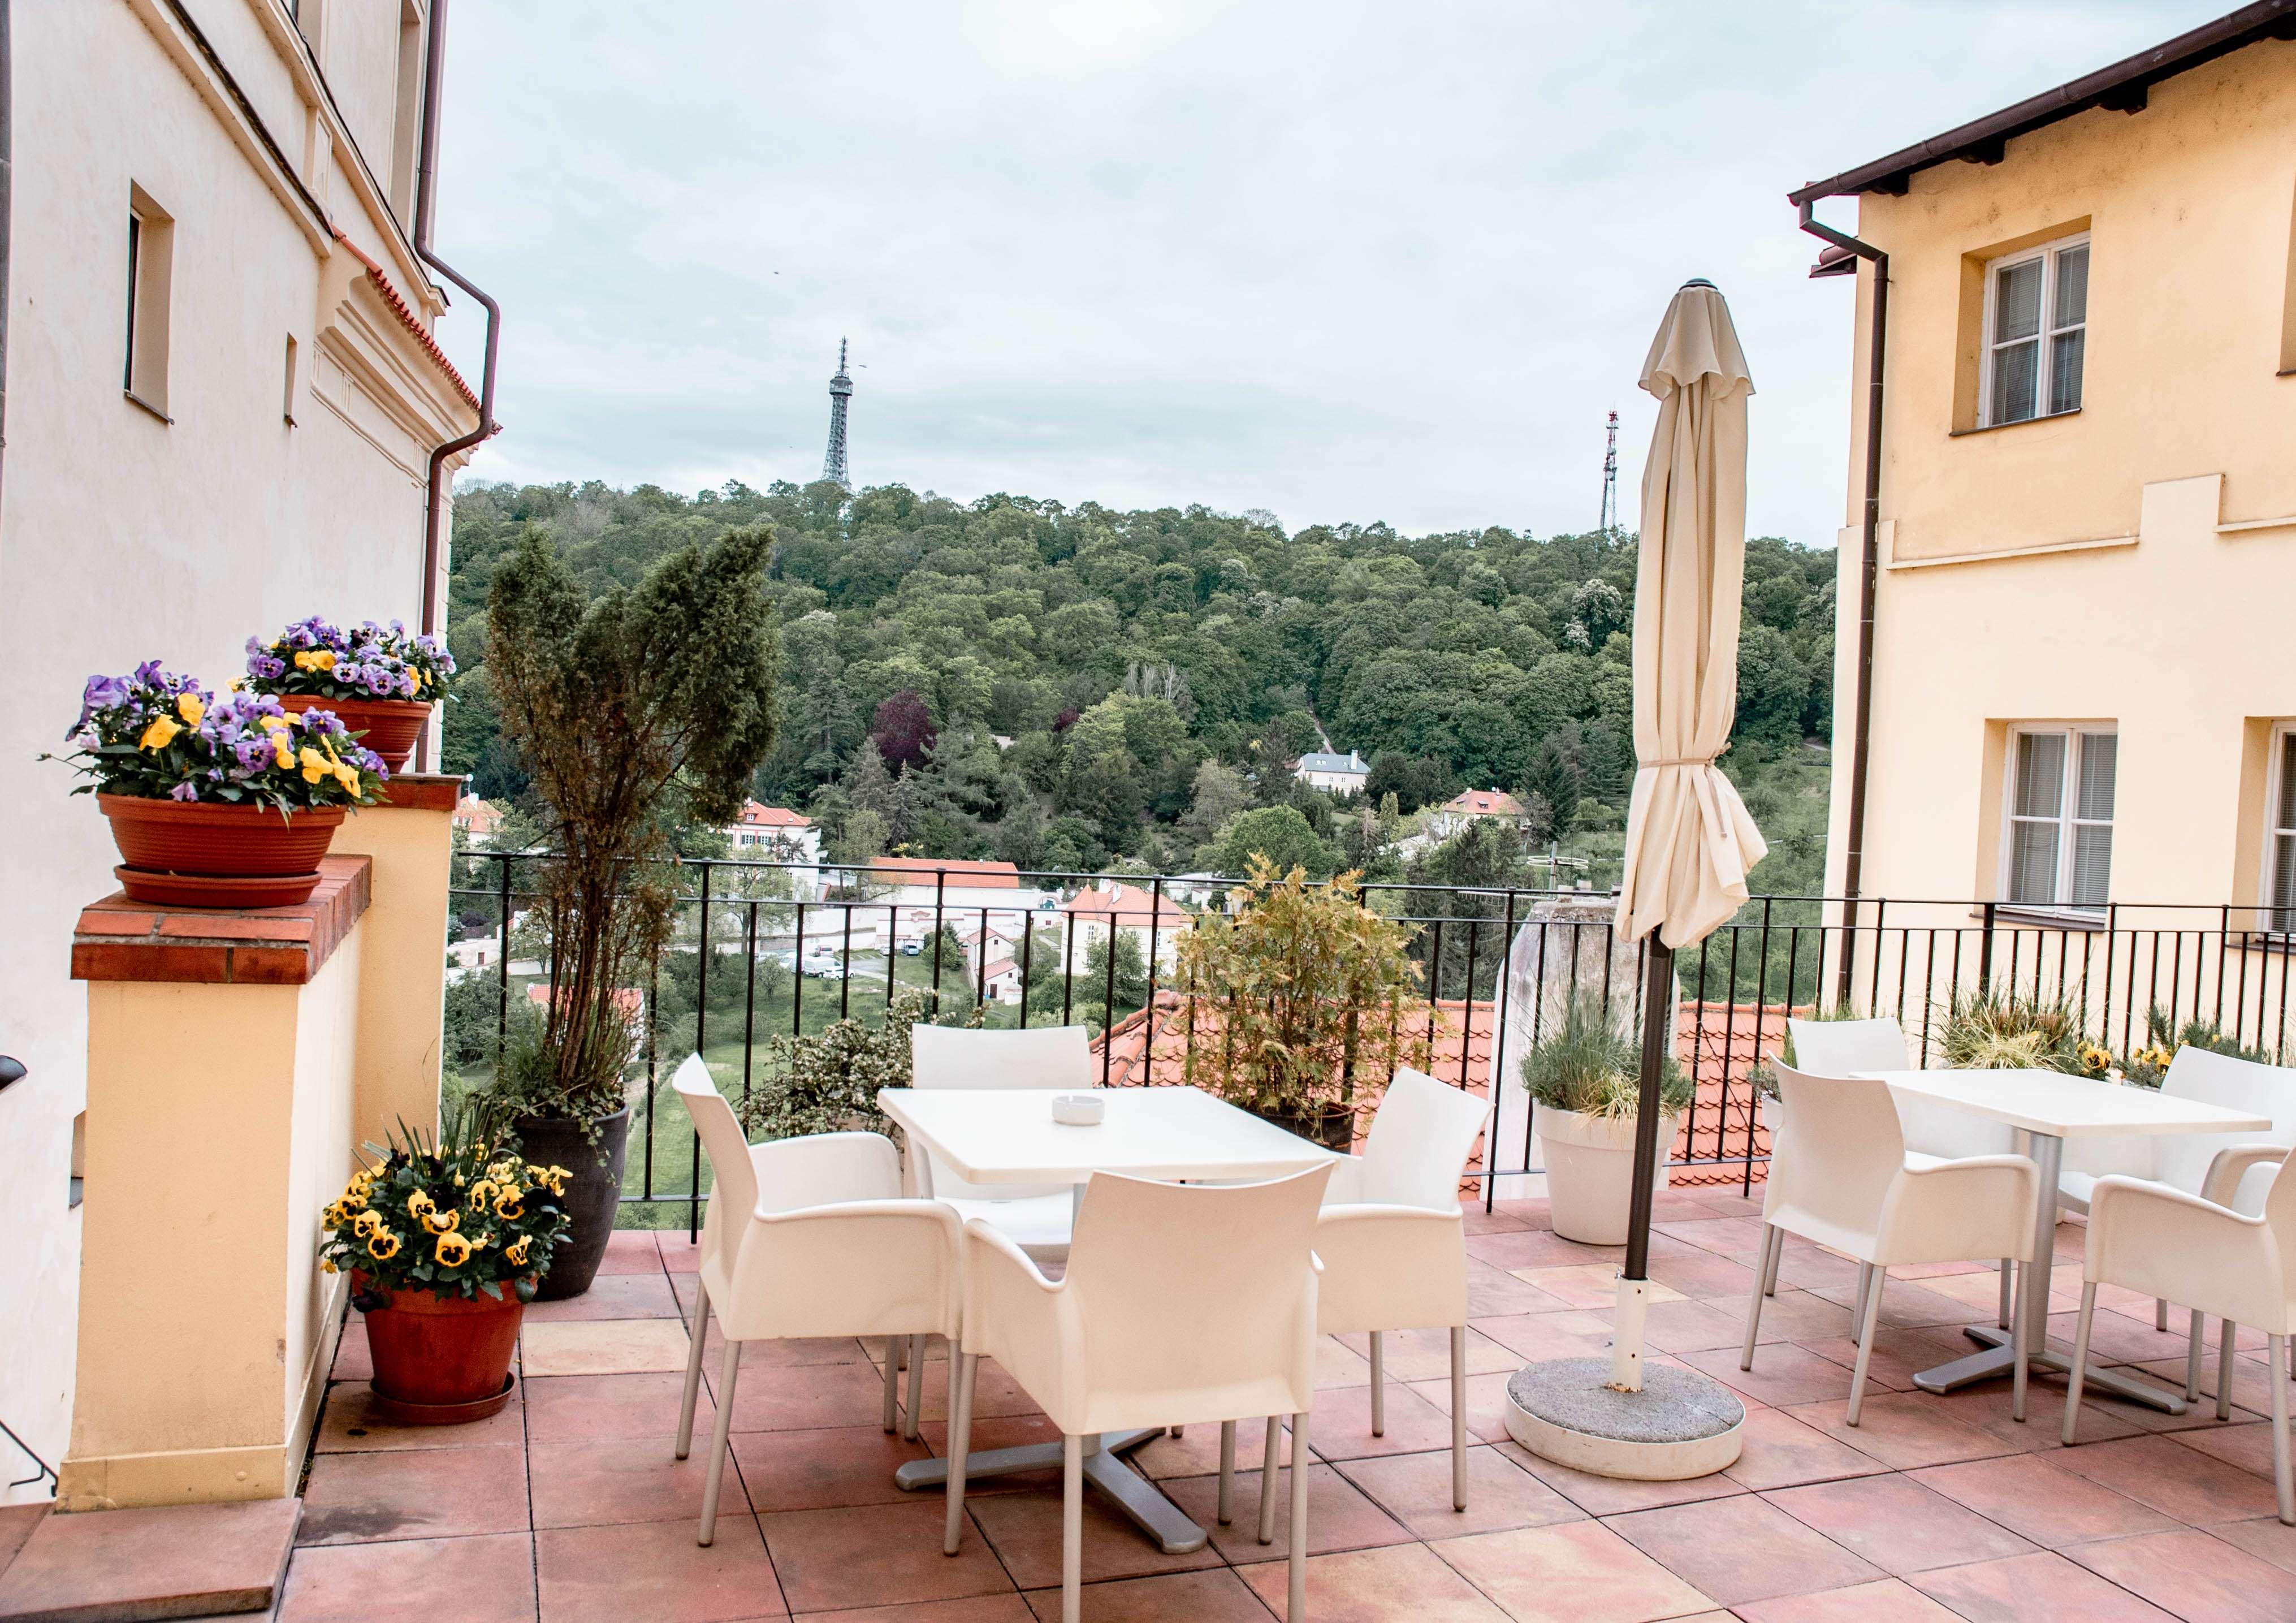 Terrace at Domus Henrici